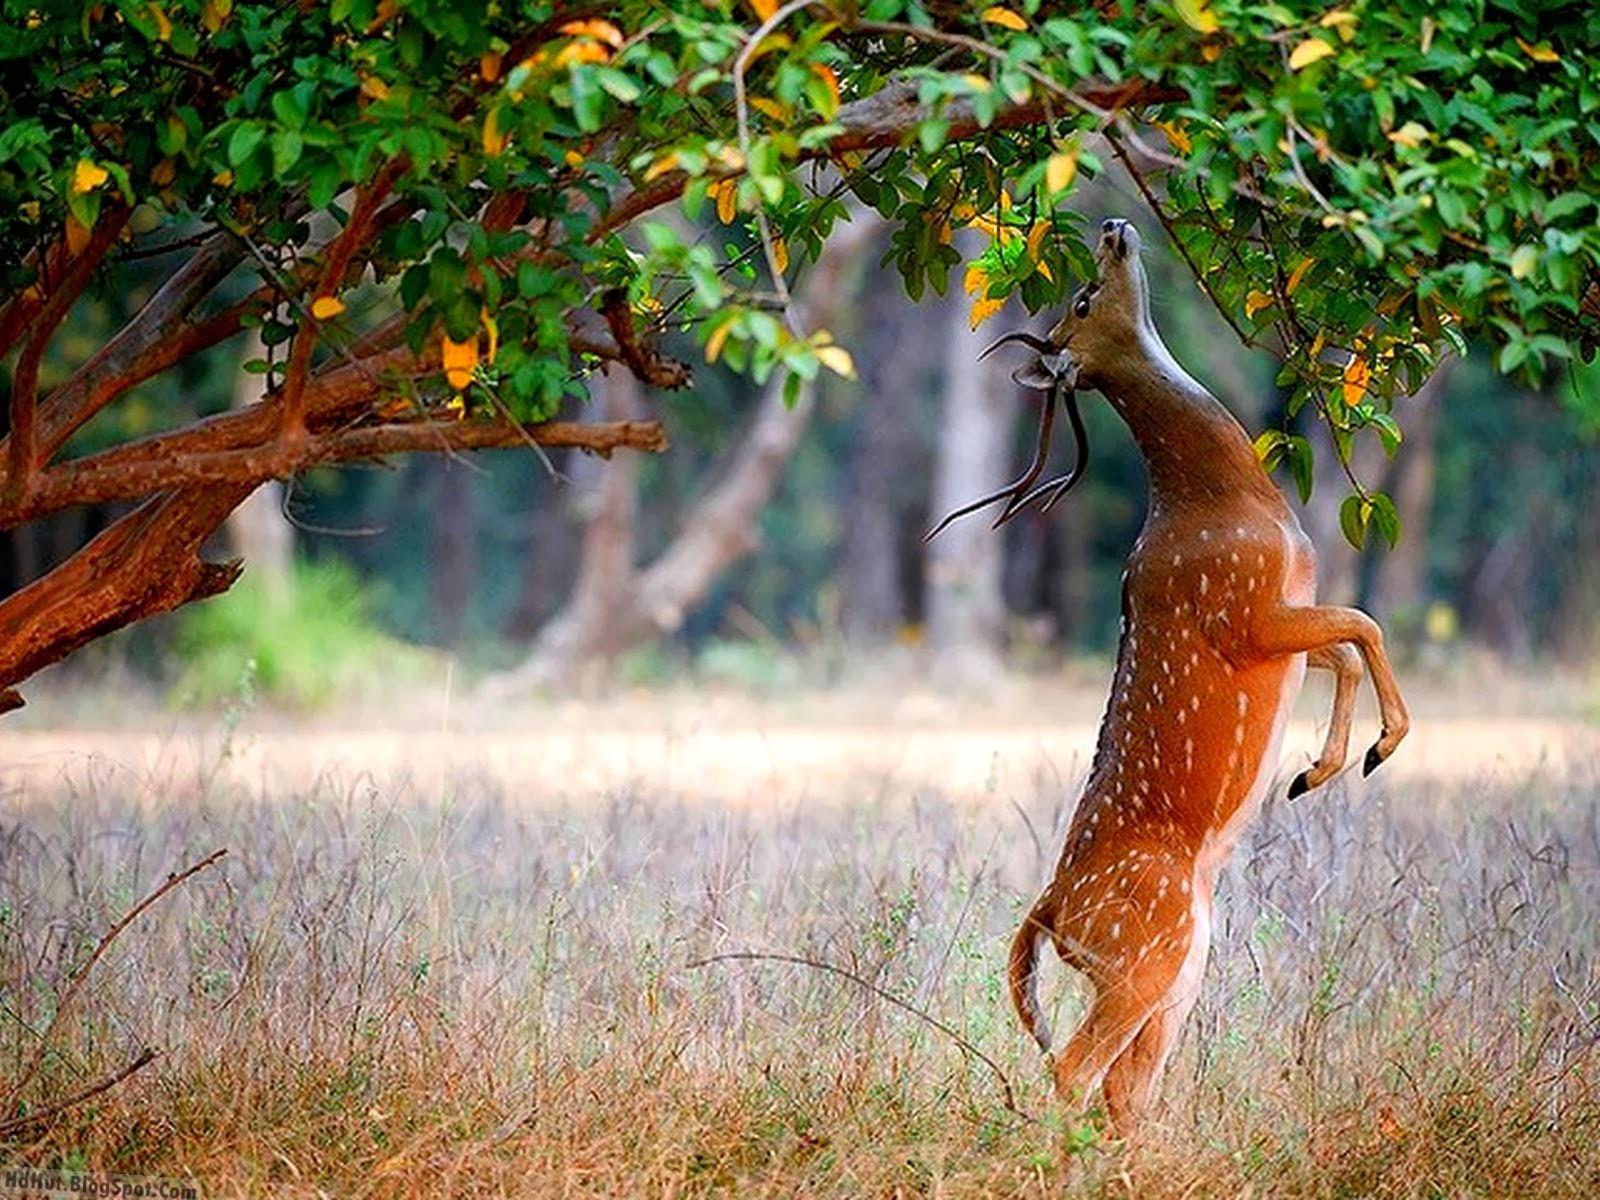 Top 14 Beautiful Deer Wallpapers In HD | OSO wilangon